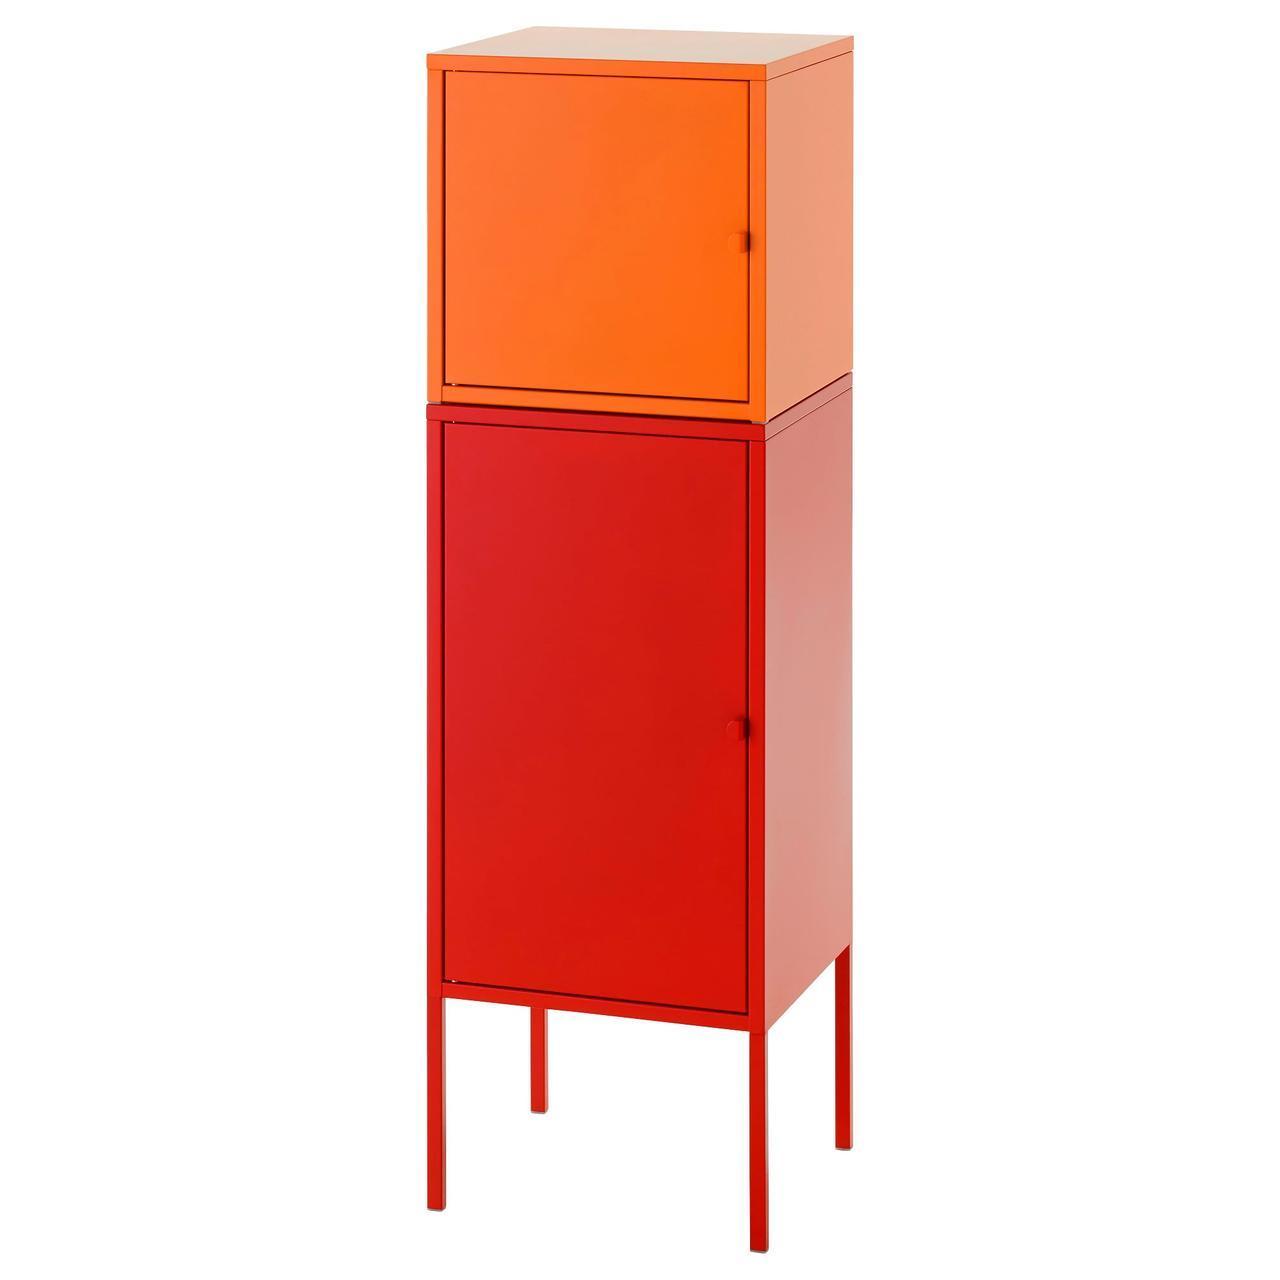 IKEA LIXHULT Шкаф, красный с оранжевым (491.616.09)